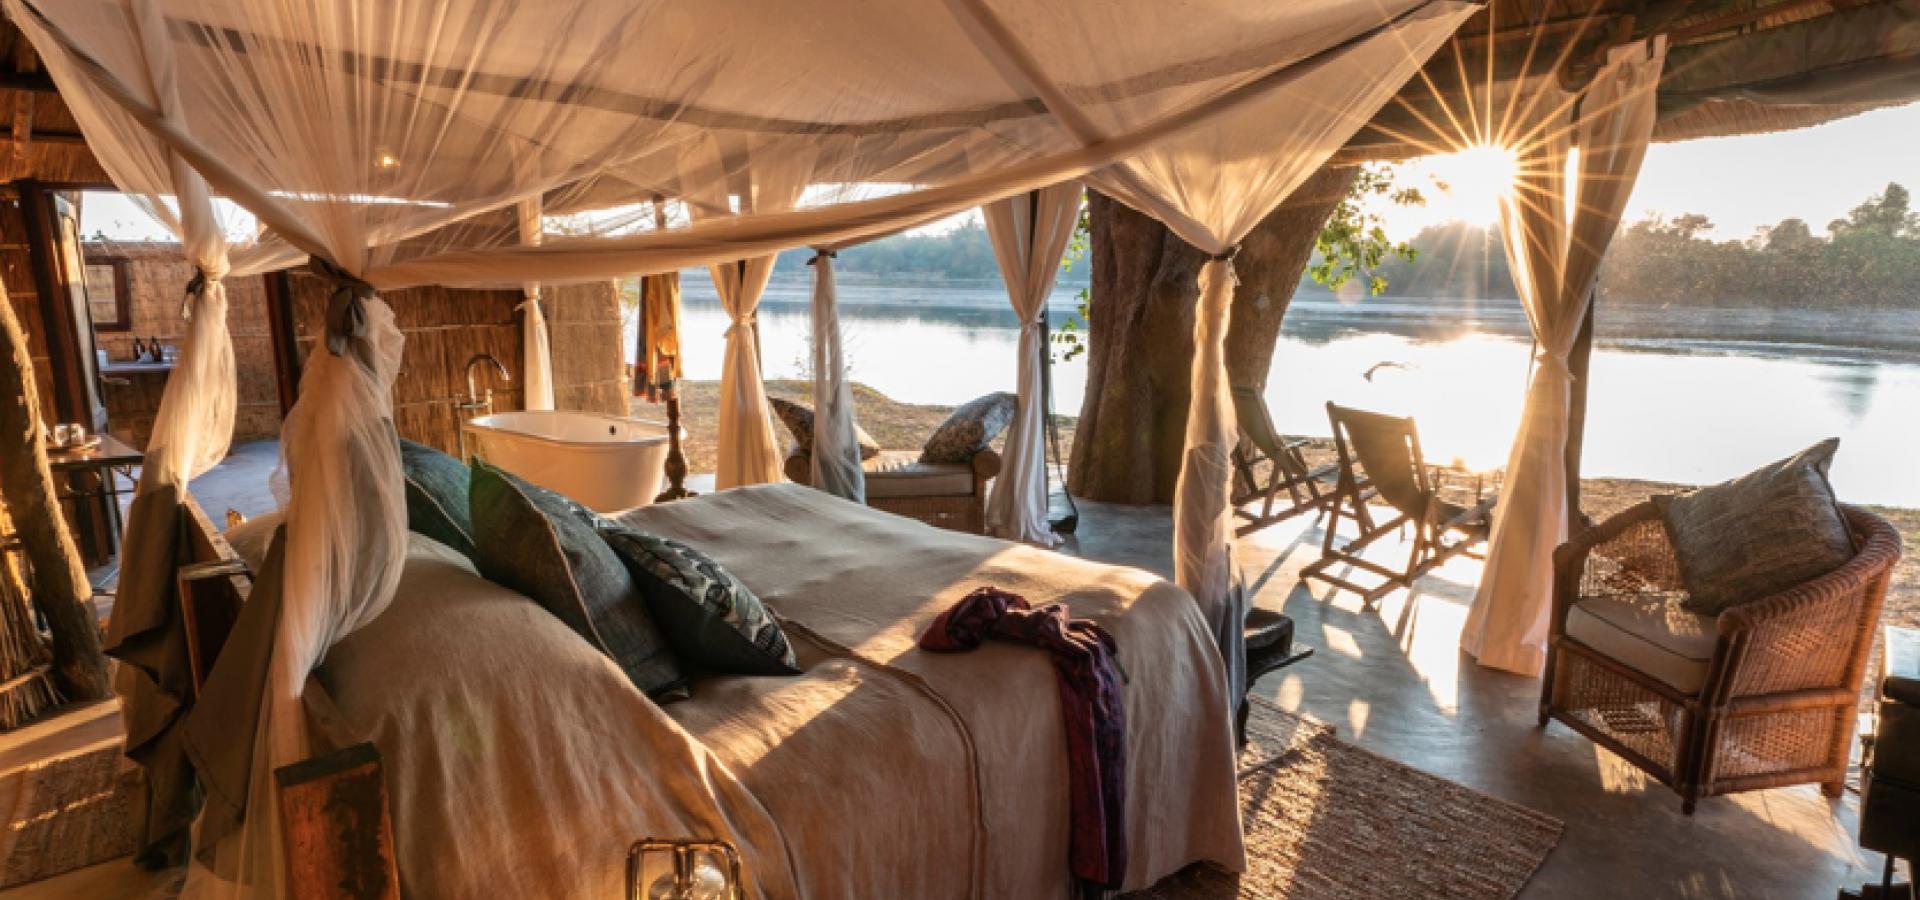 Romantische Wildnis EXKLUSIVE FLUGSAFARI IN ZAMBIA UND STRANDURLAUB AM LAKE MALAWI